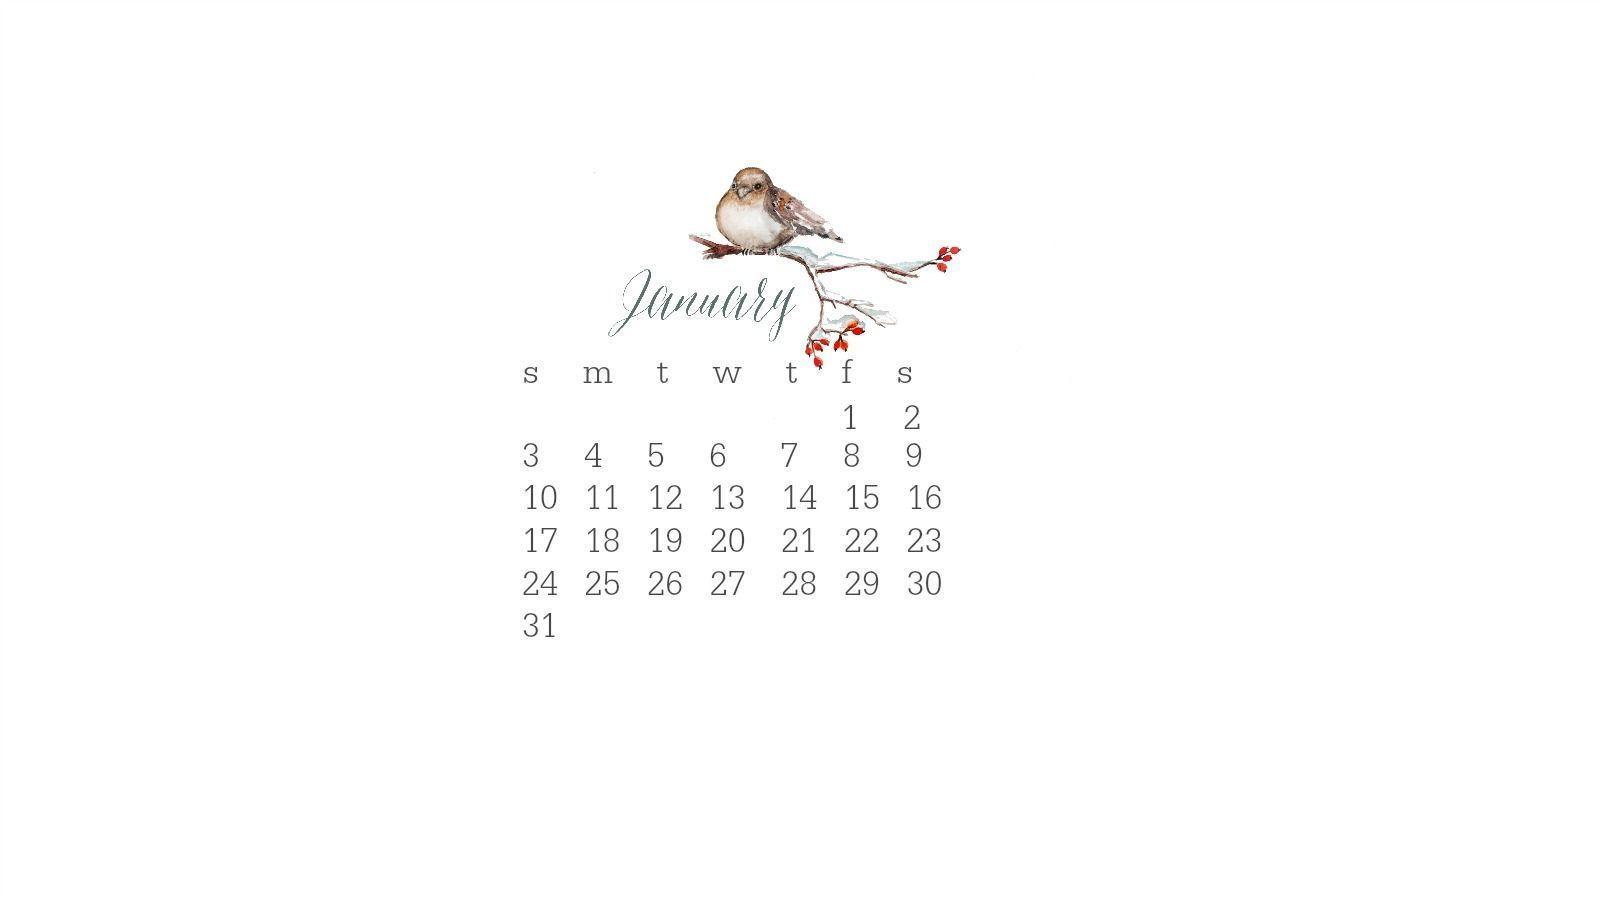 google calendar january 2016 wallpaper - photo #3